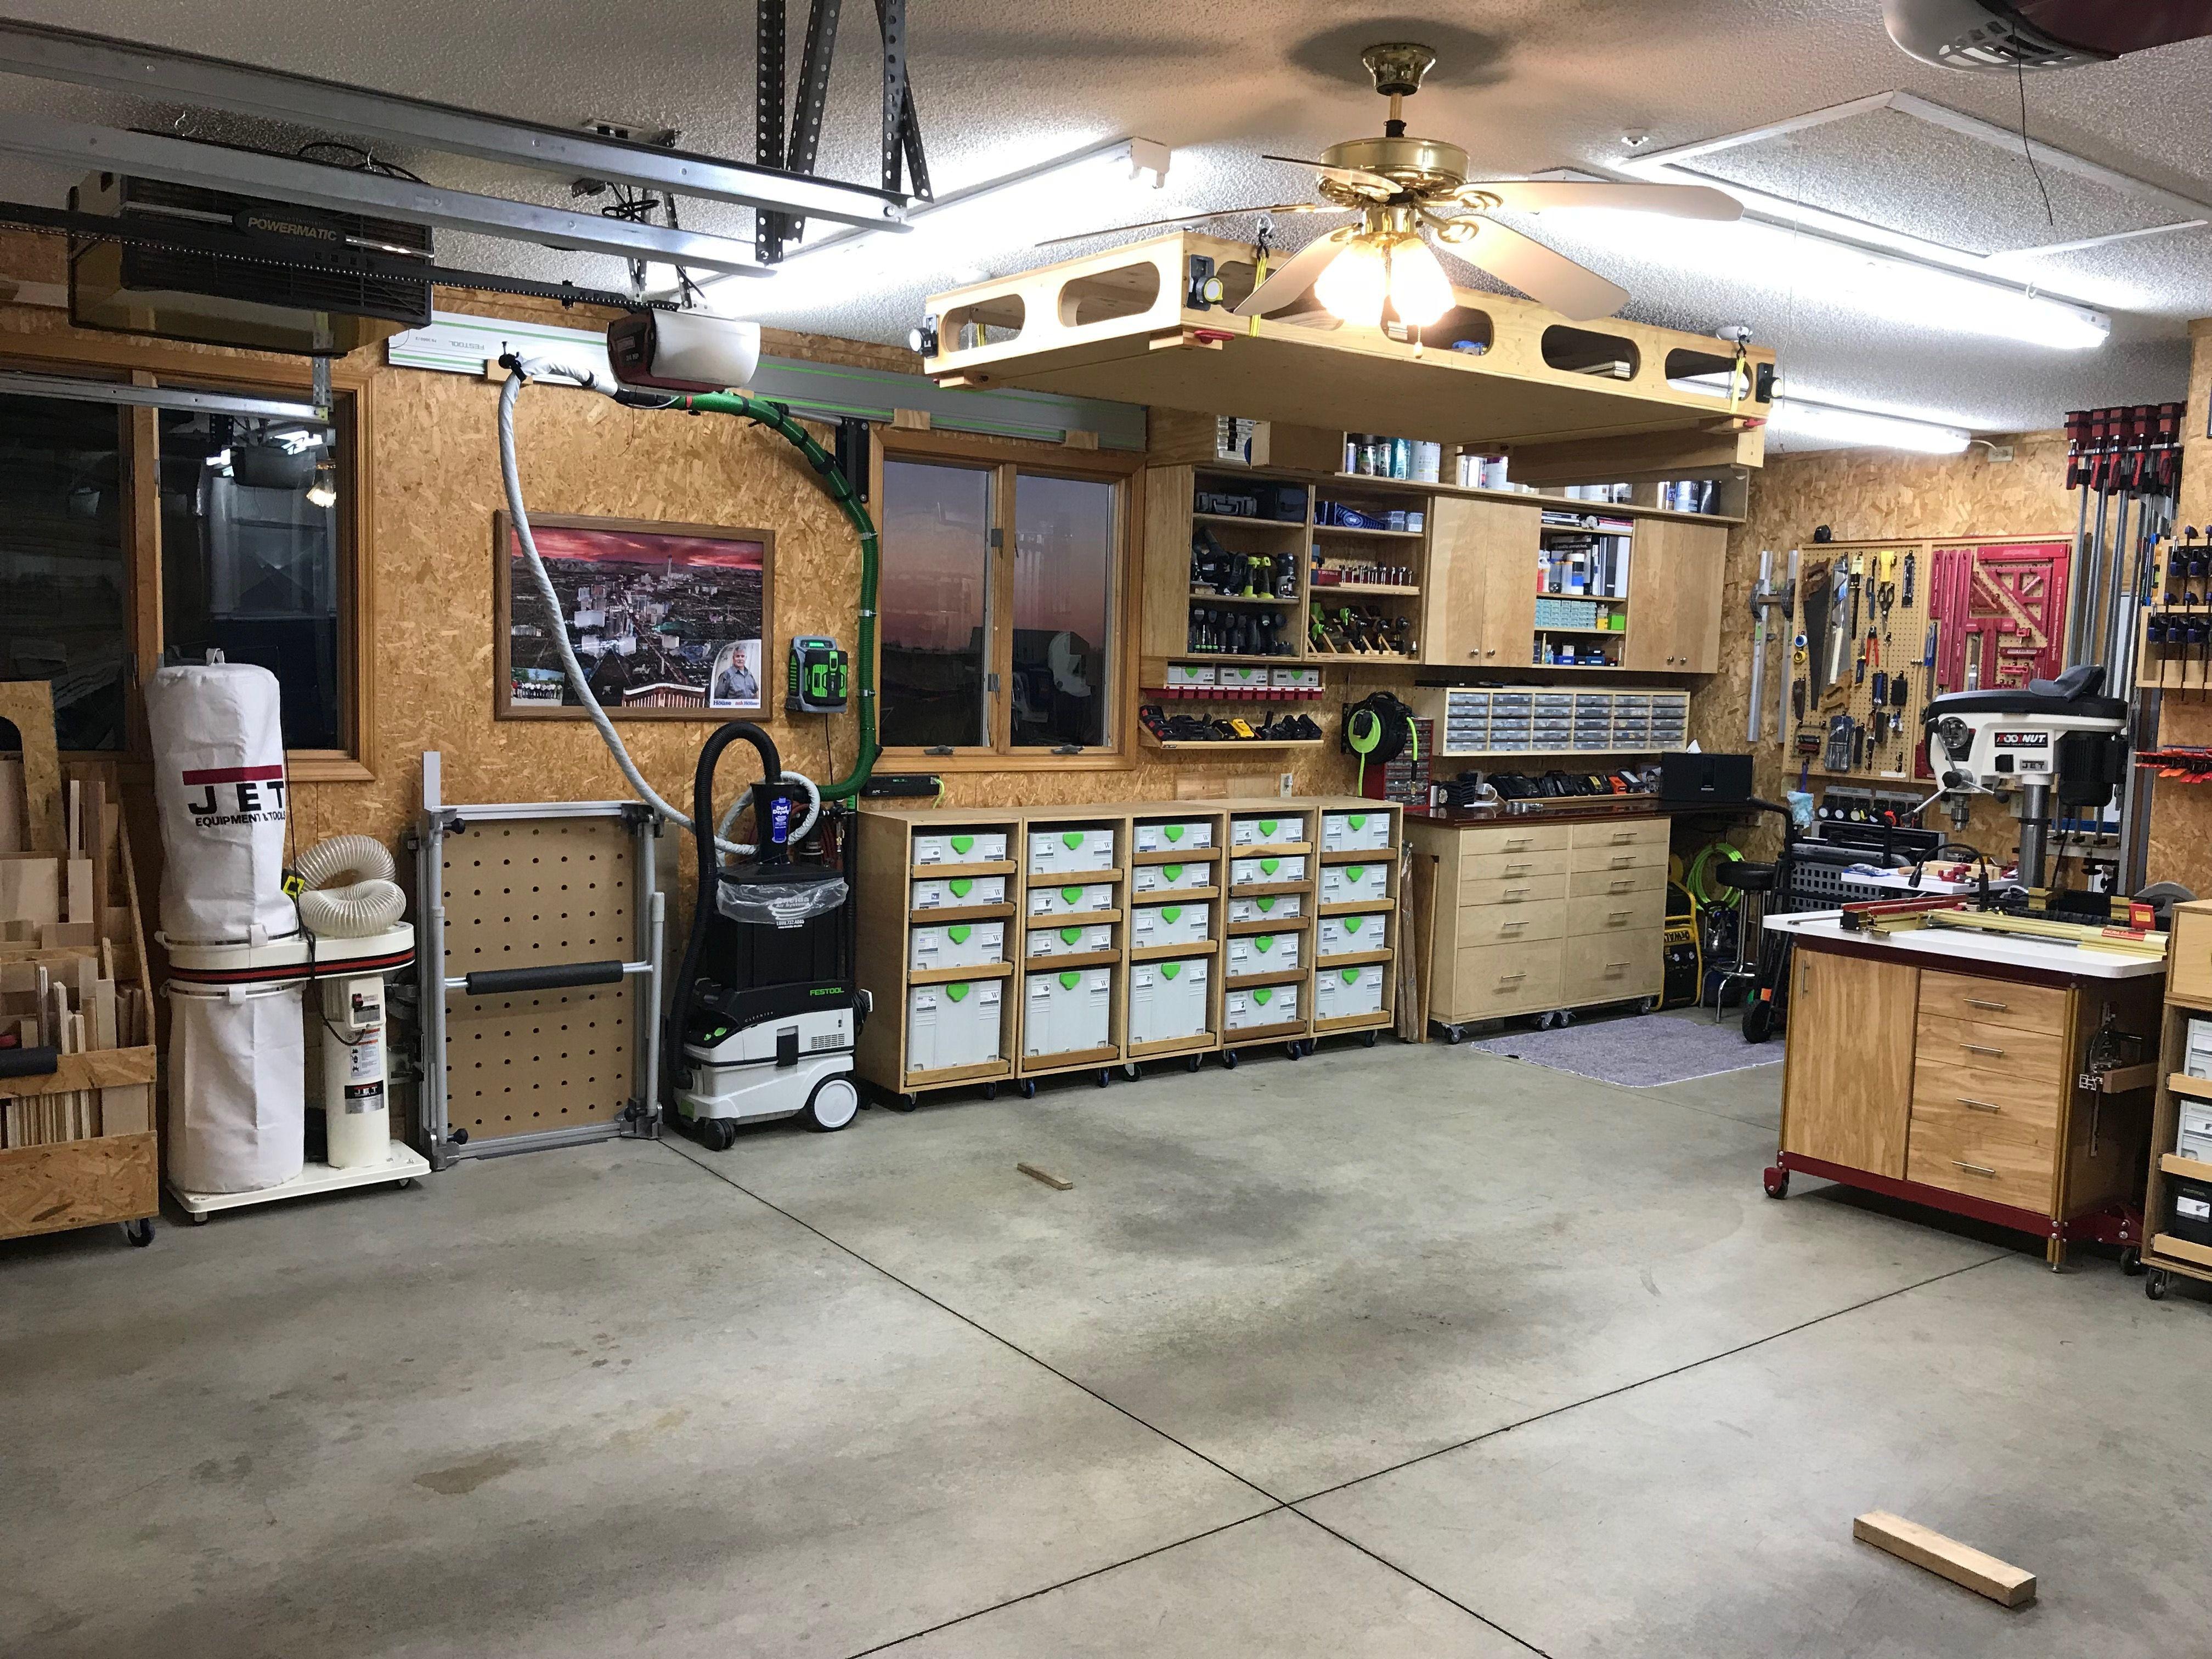 Pin By Peter On Woodworking Garage Workshop Garage Shop Shop Layout